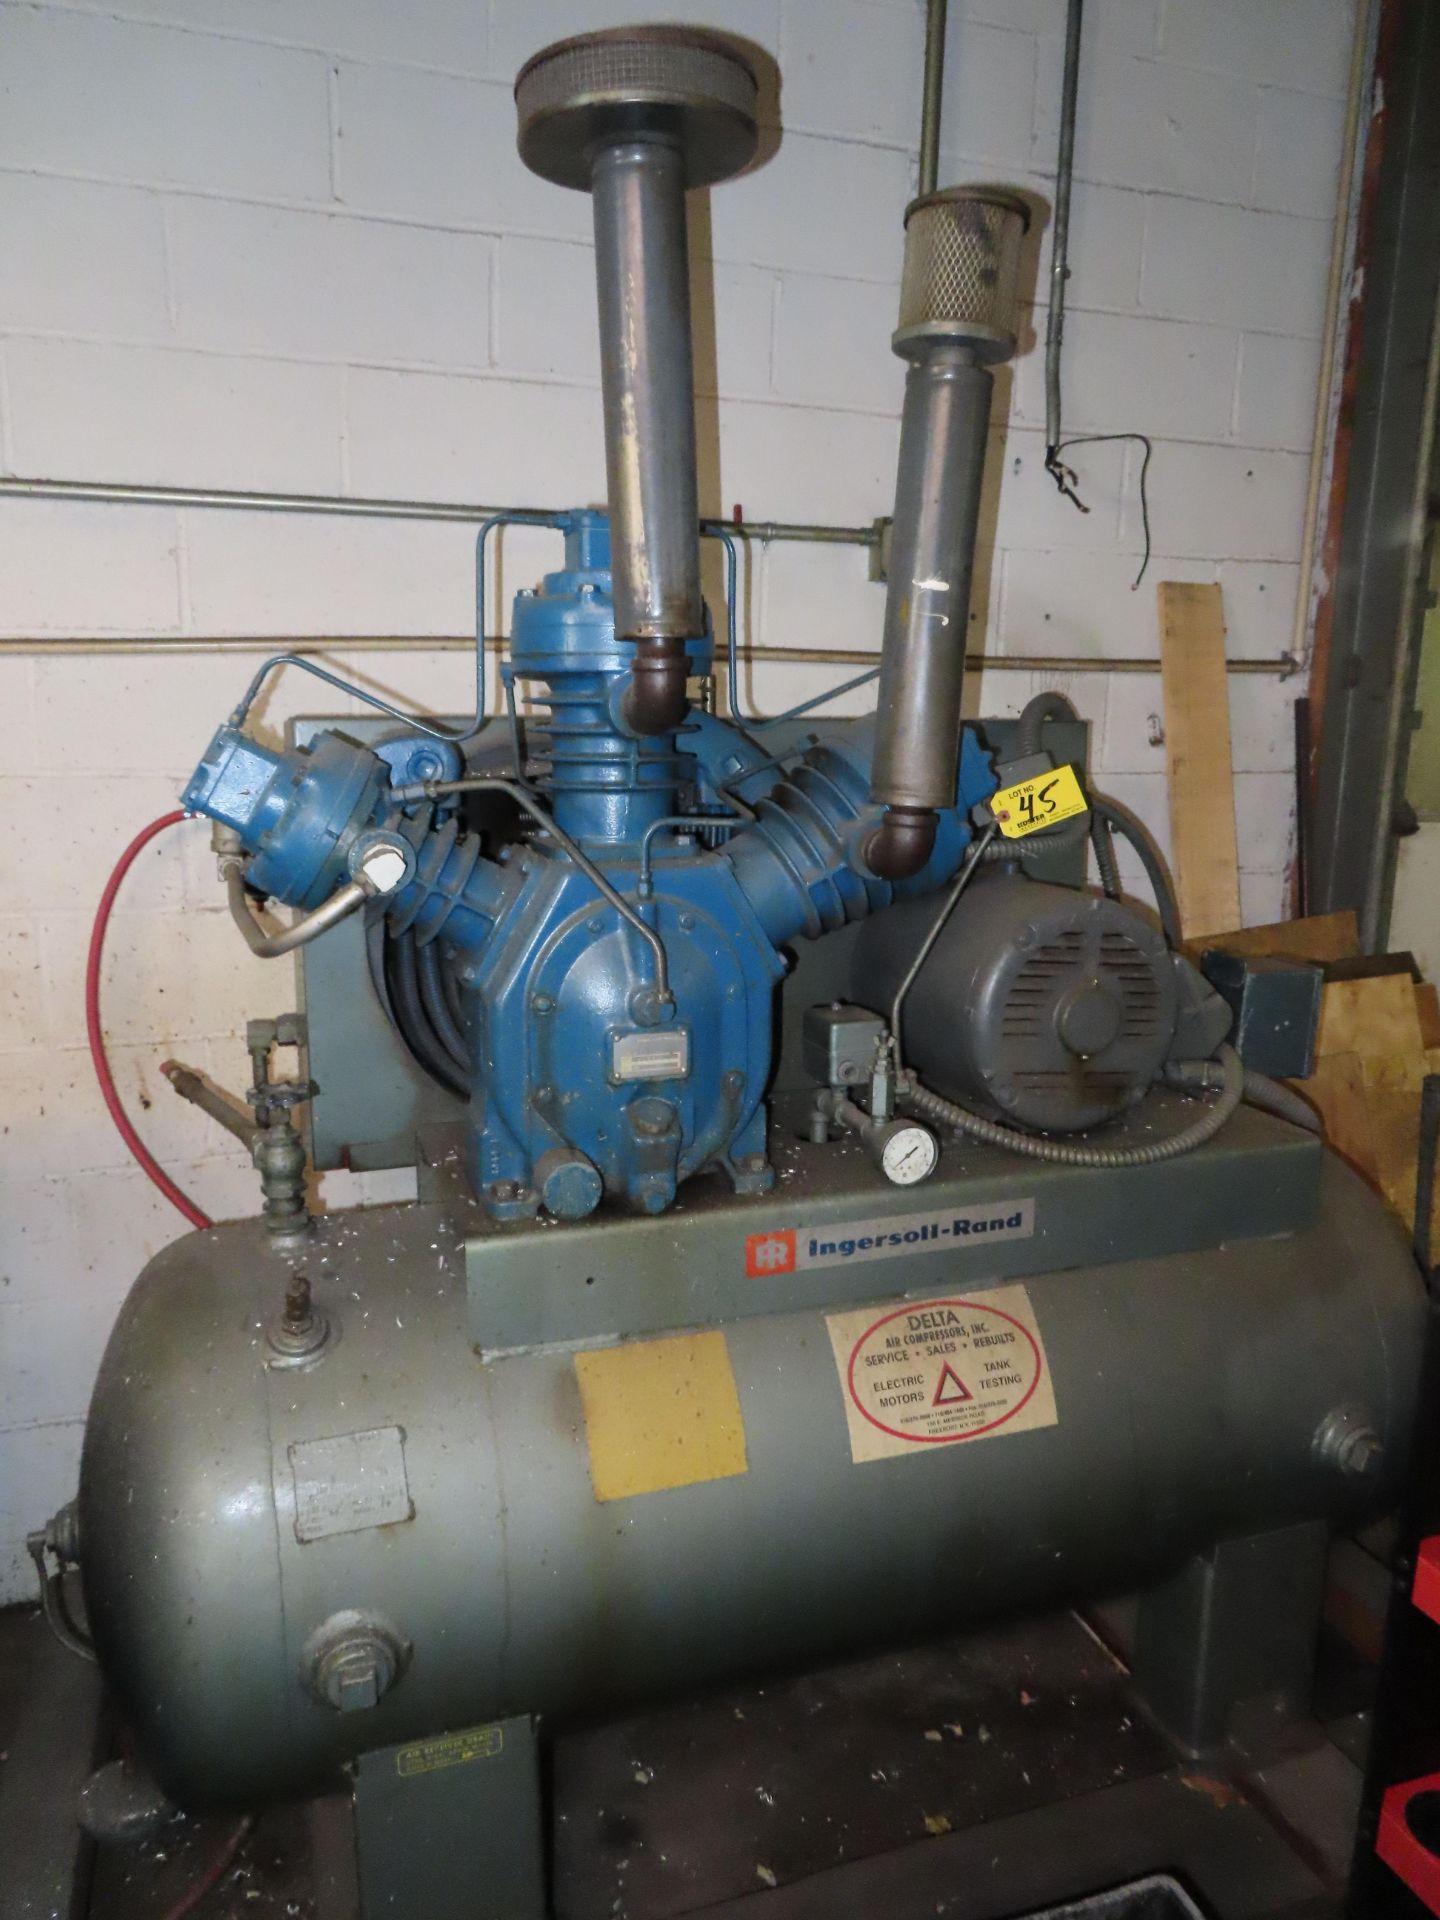 INGERSOLL RAND TYPE 30 MDL. 15TM PISTON TYPE HORIZONTAL TANK MOUNTED AIR COMPRESSOR, 15HP, 3-